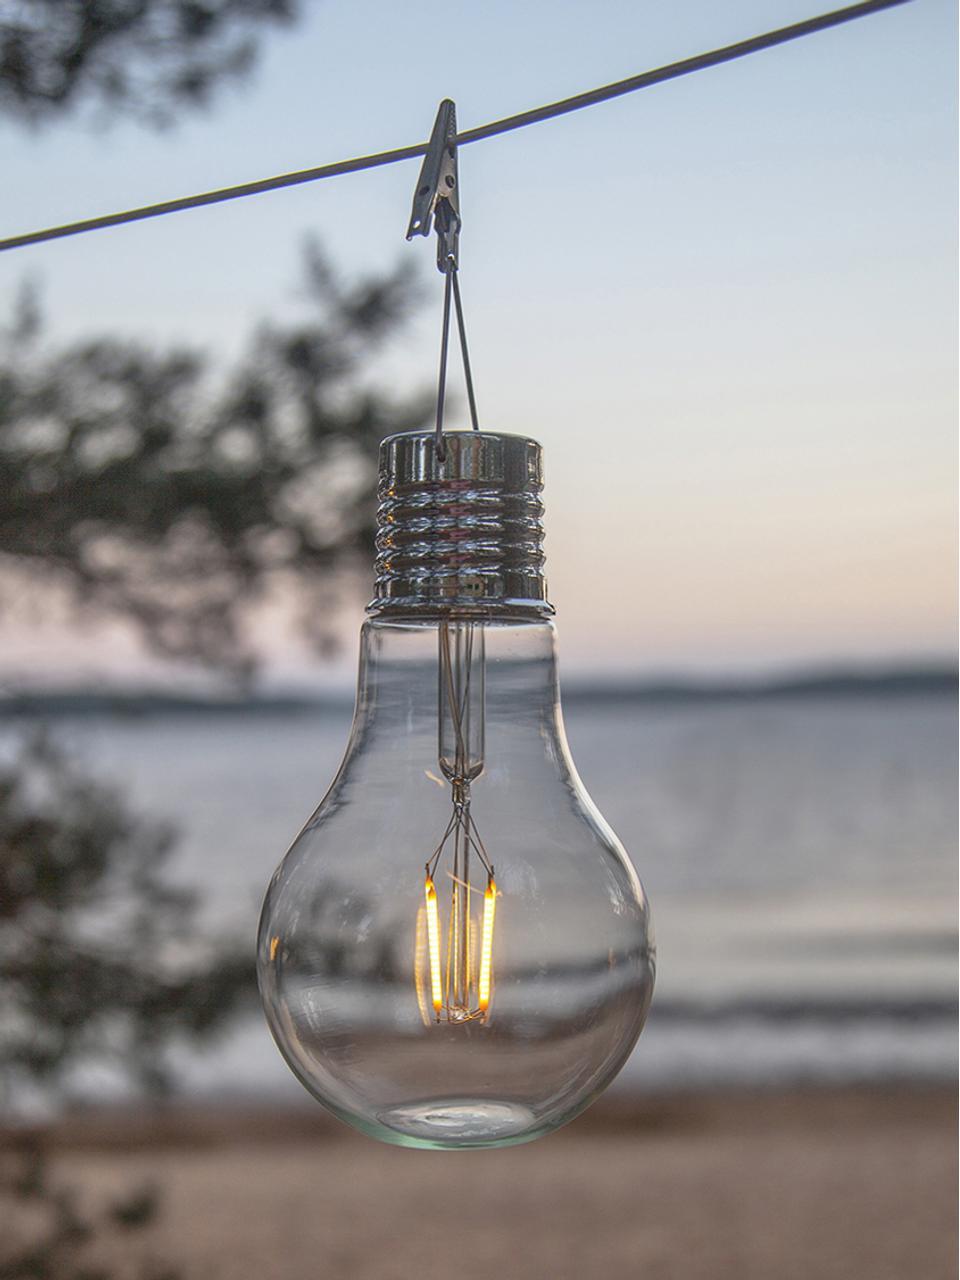 LED-Solar-Leuchtobjekte Fille, 2 Stück, Transparent, Ø 10 x H 18 cm